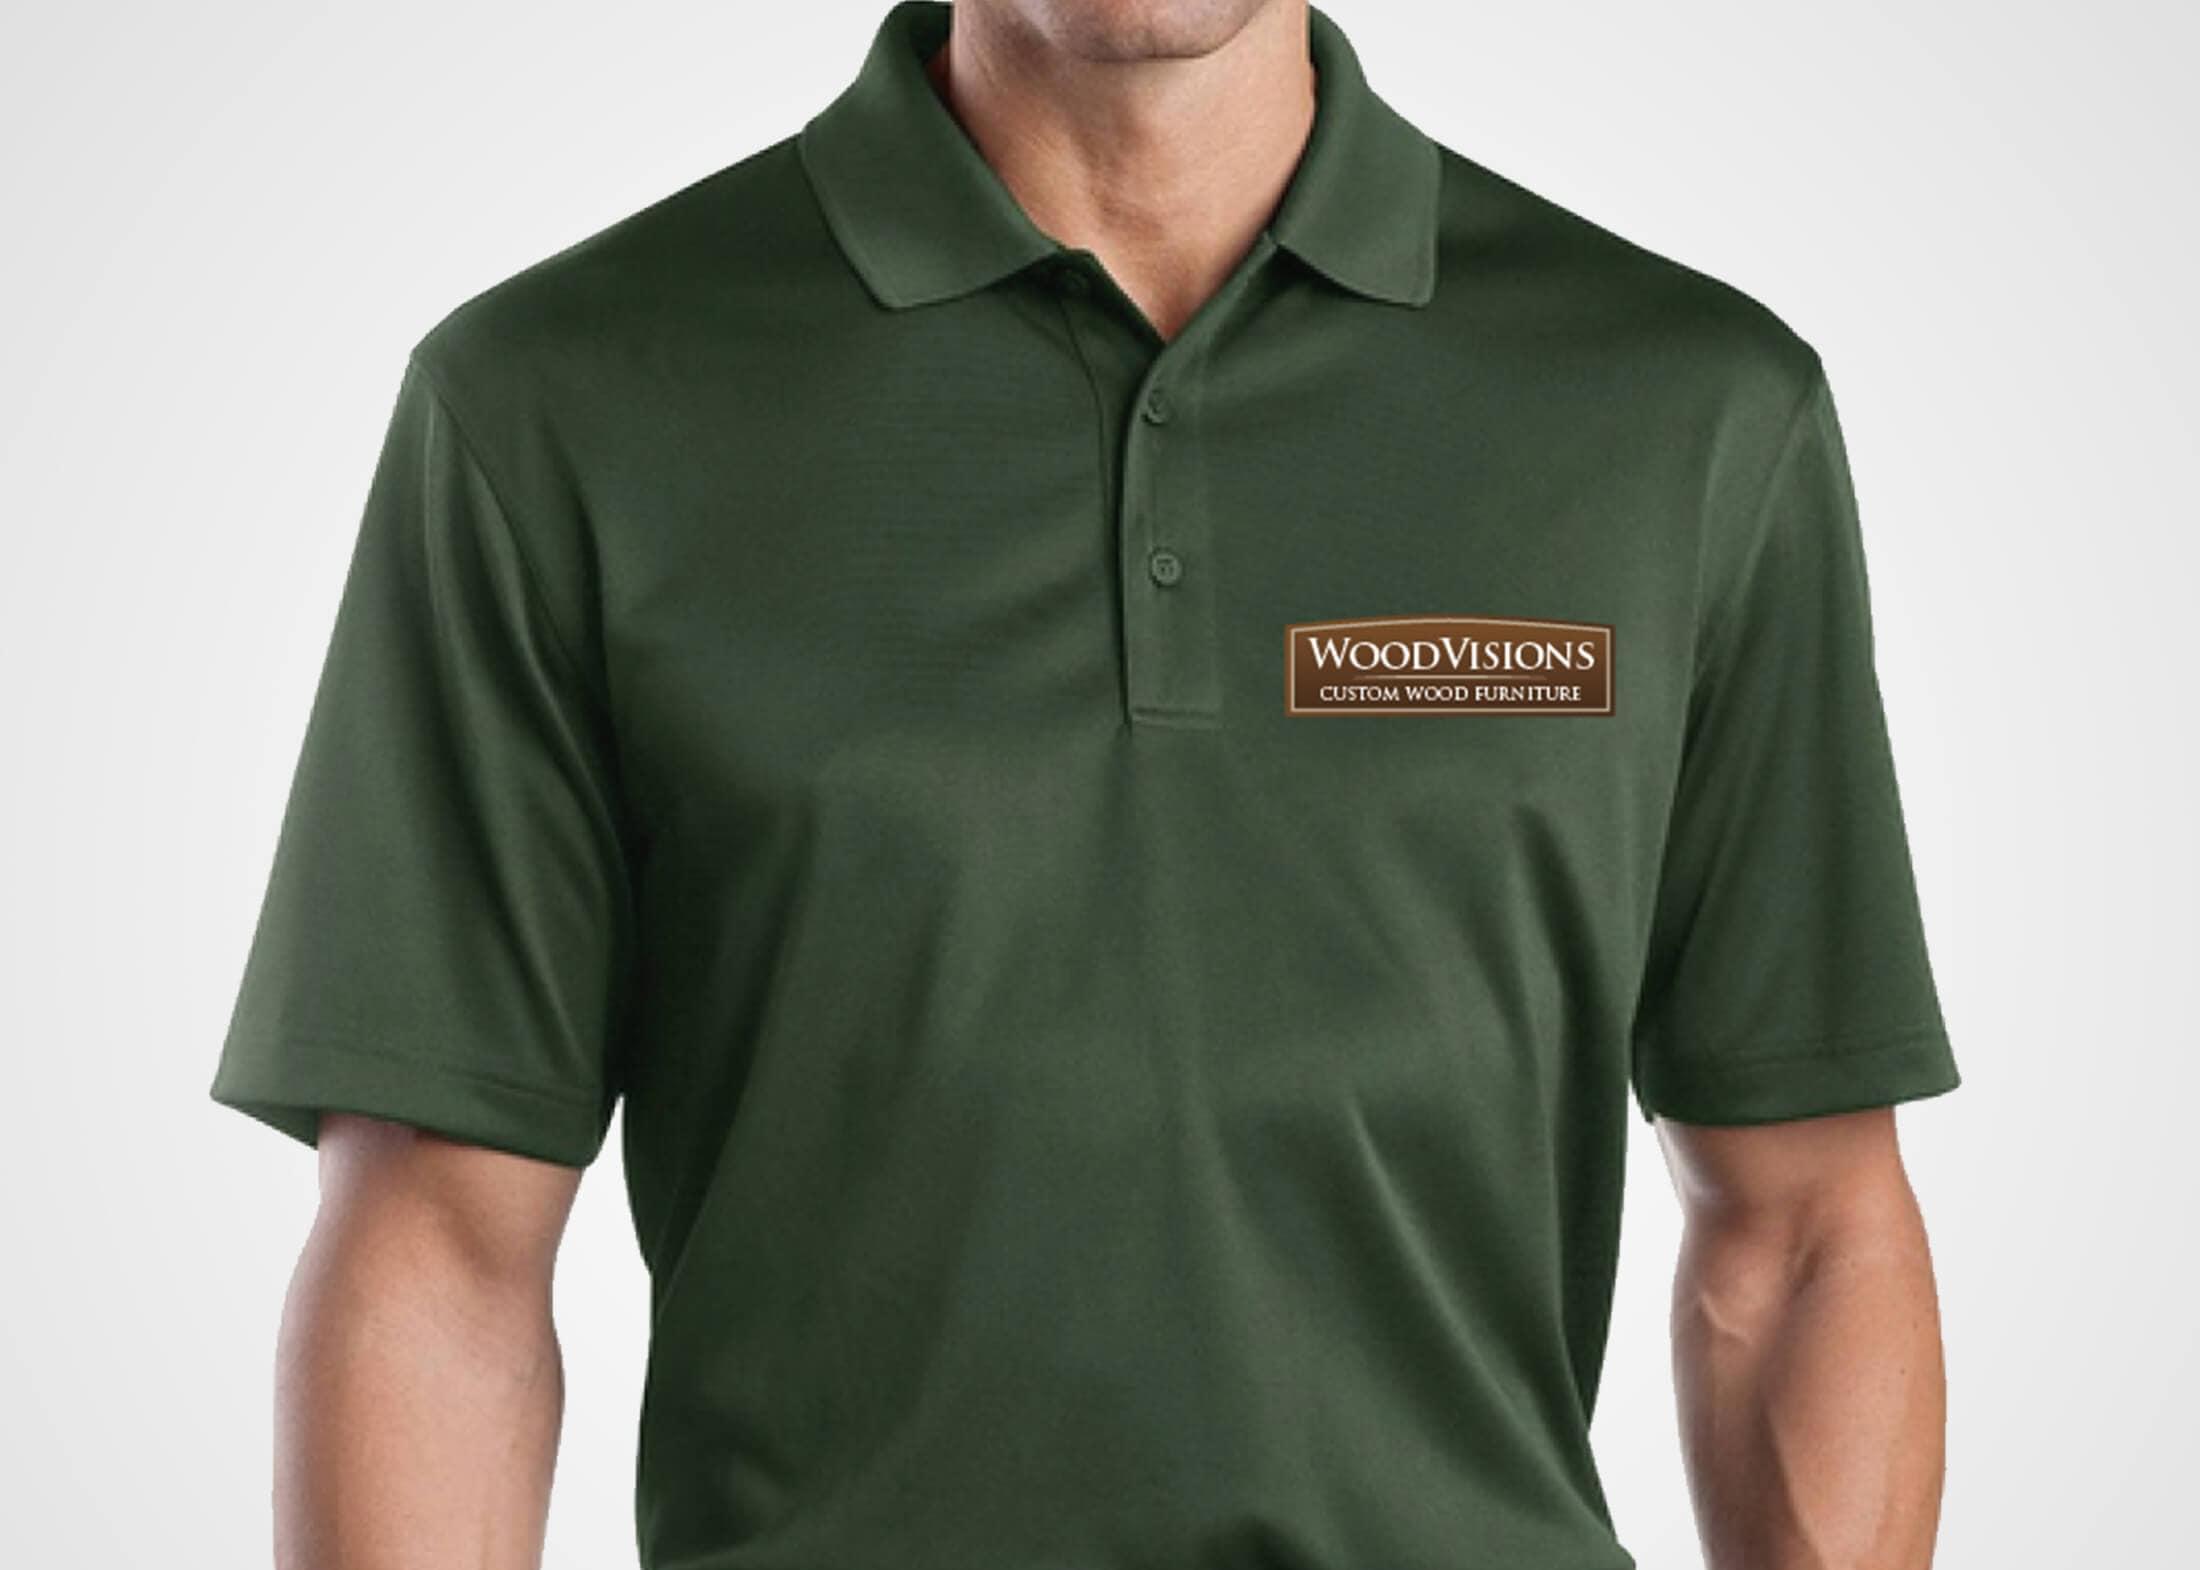 woodvisions-shirt-1